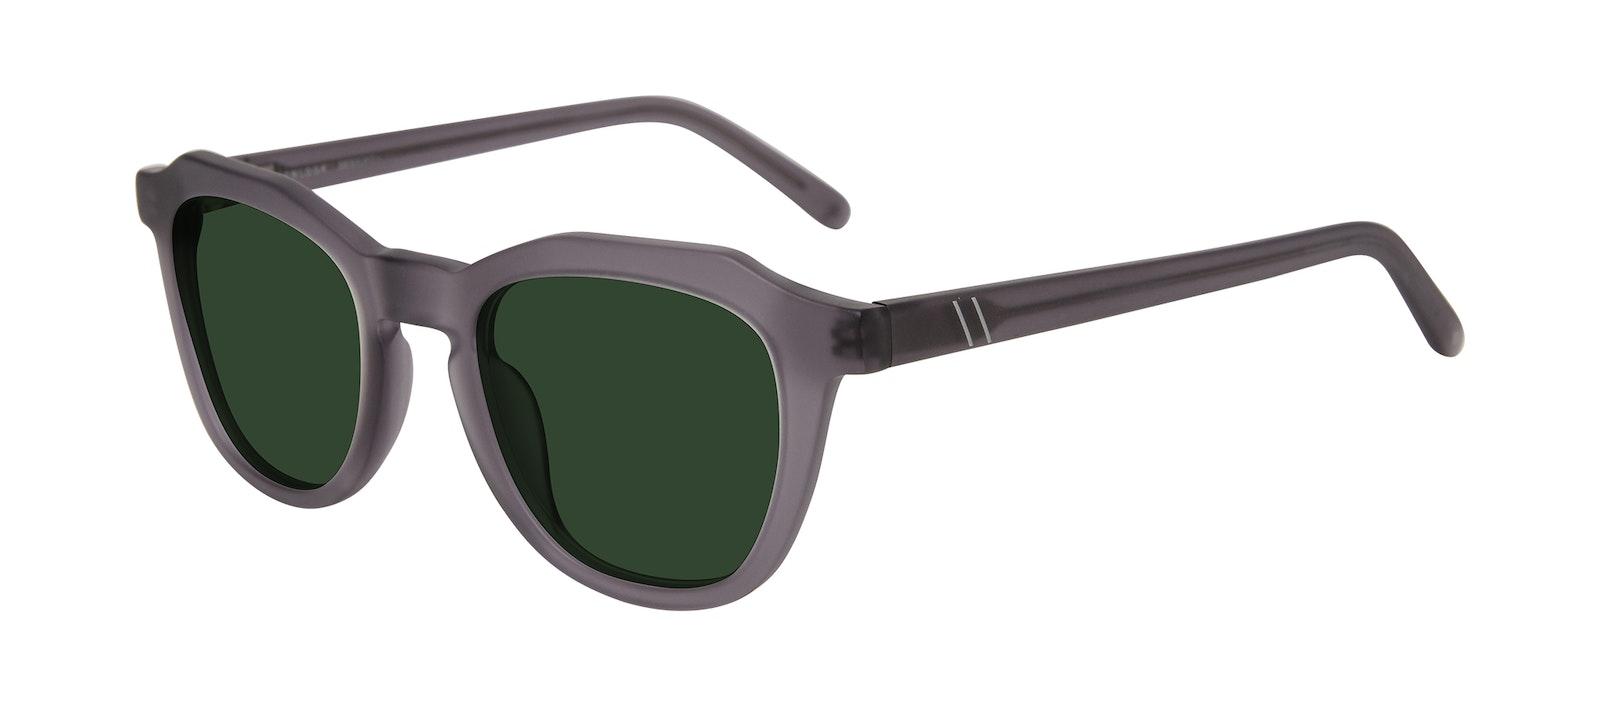 Affordable Fashion Glasses Square Sunglasses Men Action Matte Grey Tilt